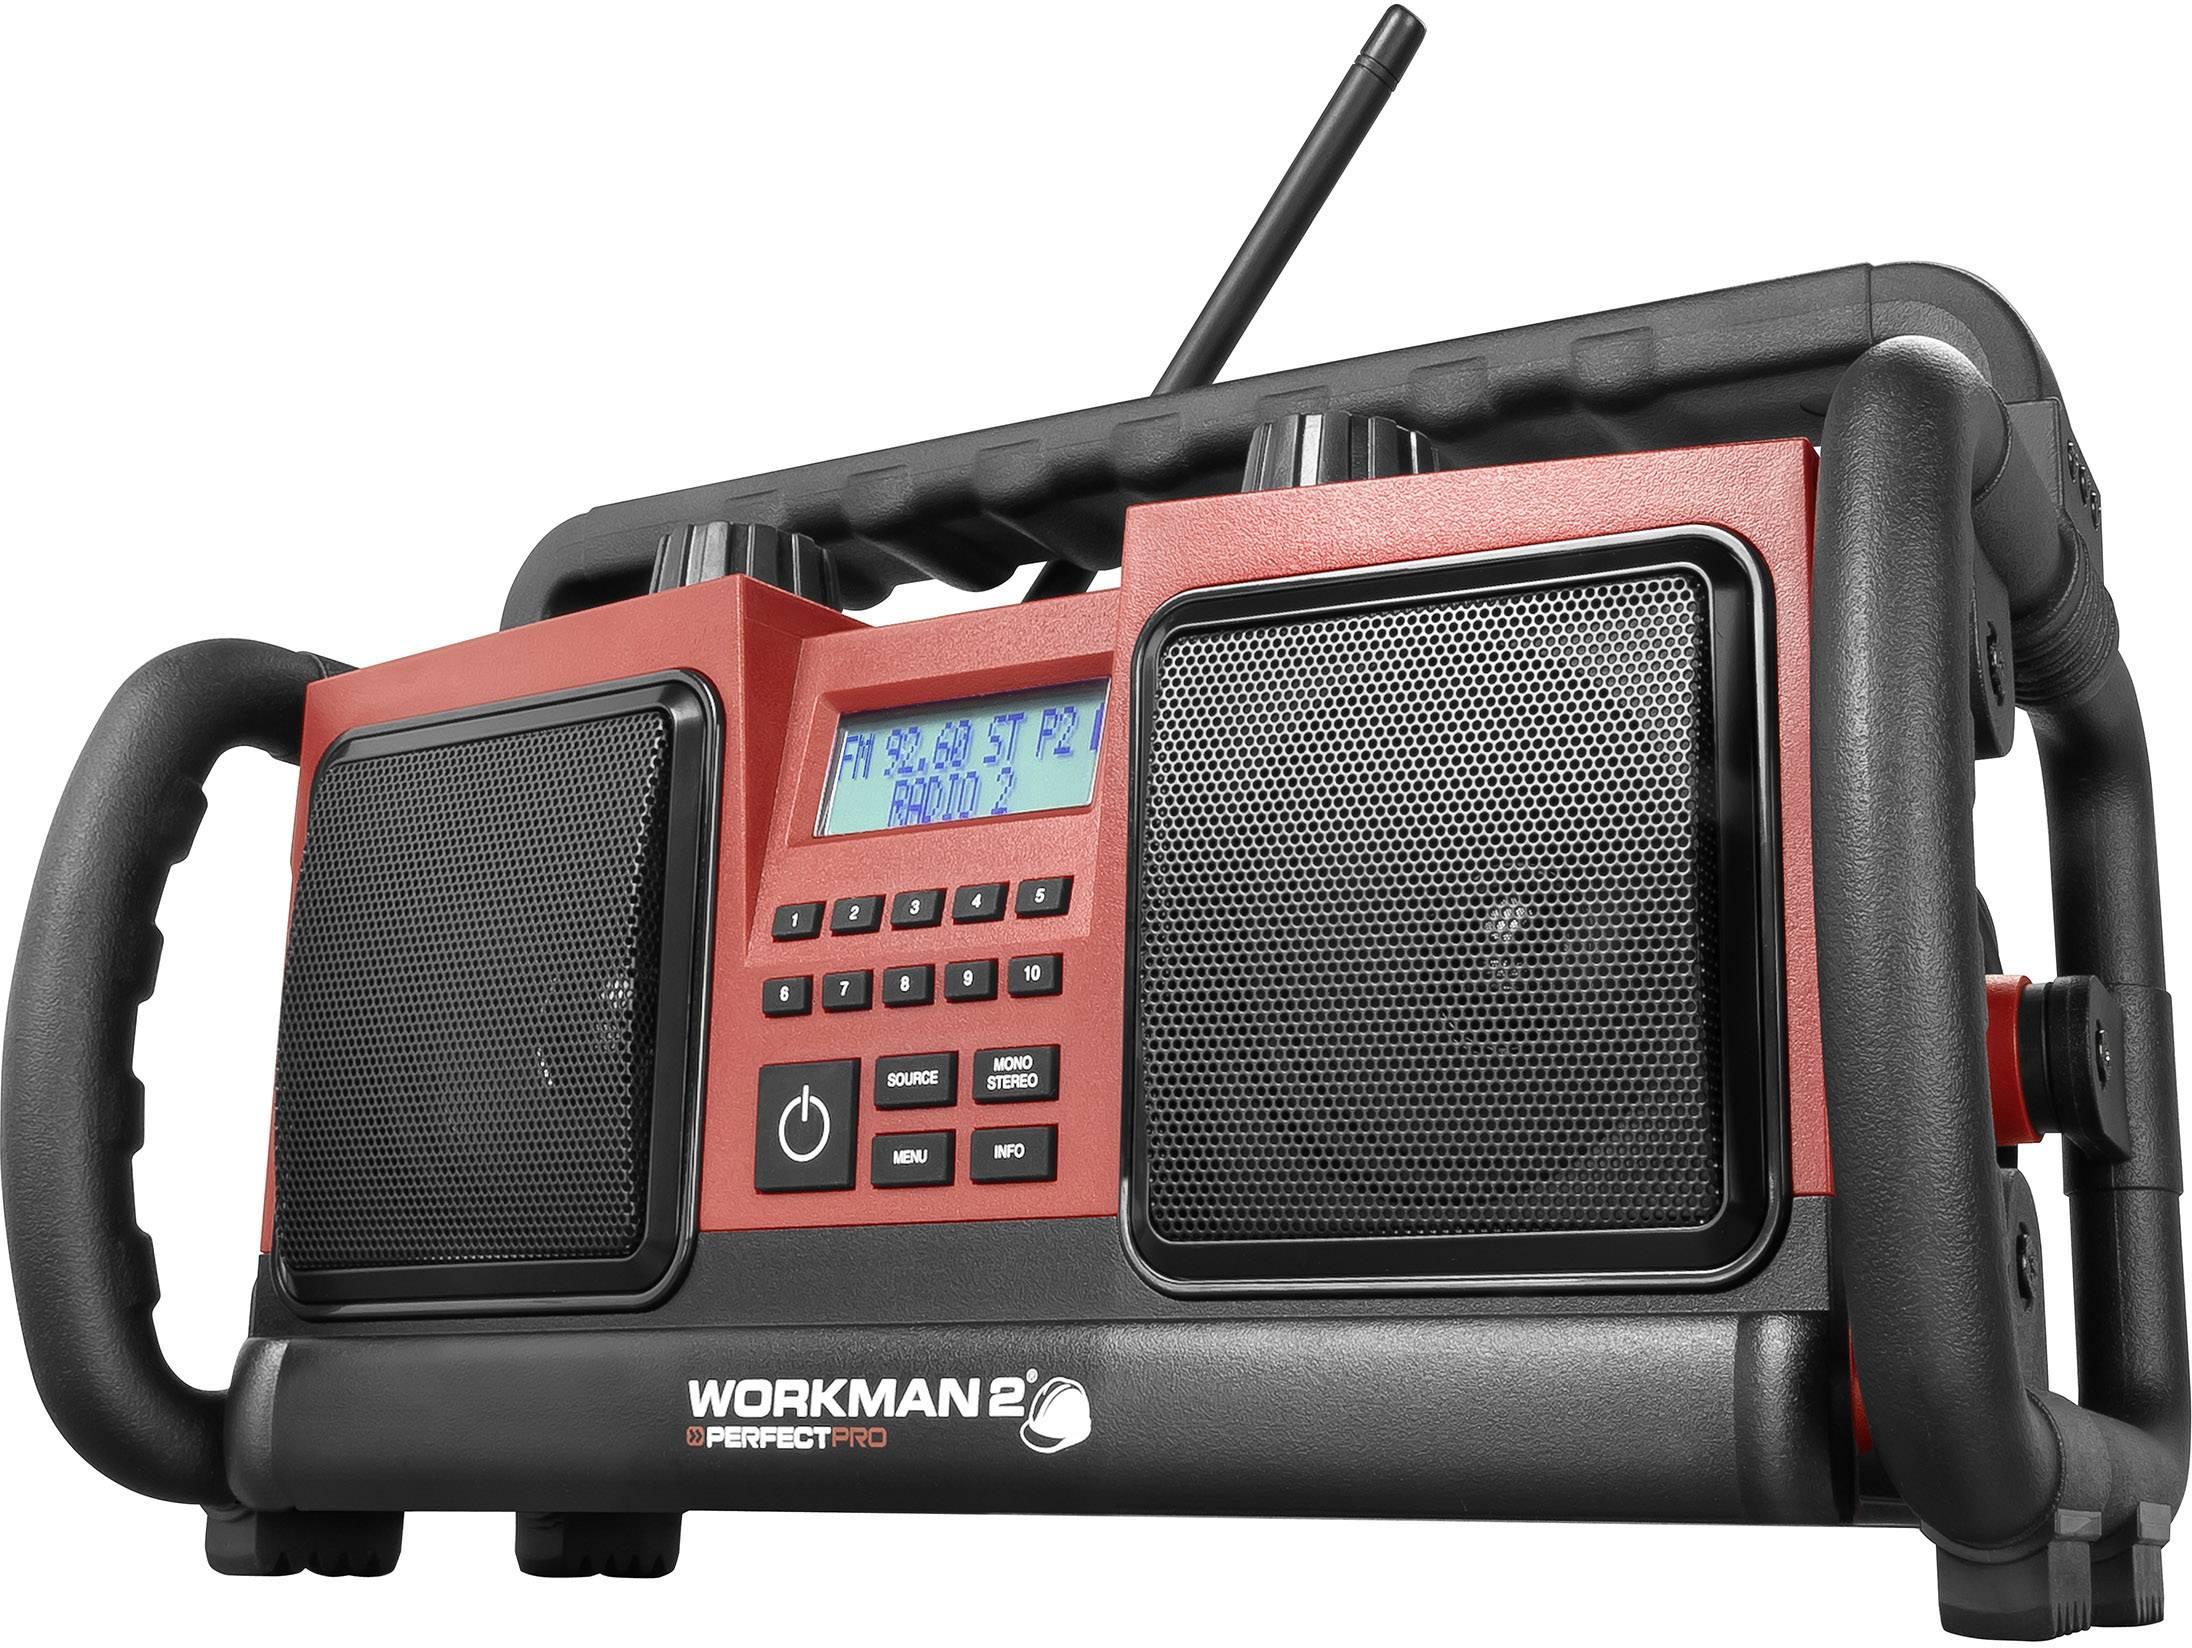 FM outdoorové rádio PerfectPro Workman 2, AUX, UKW, červená, čierna